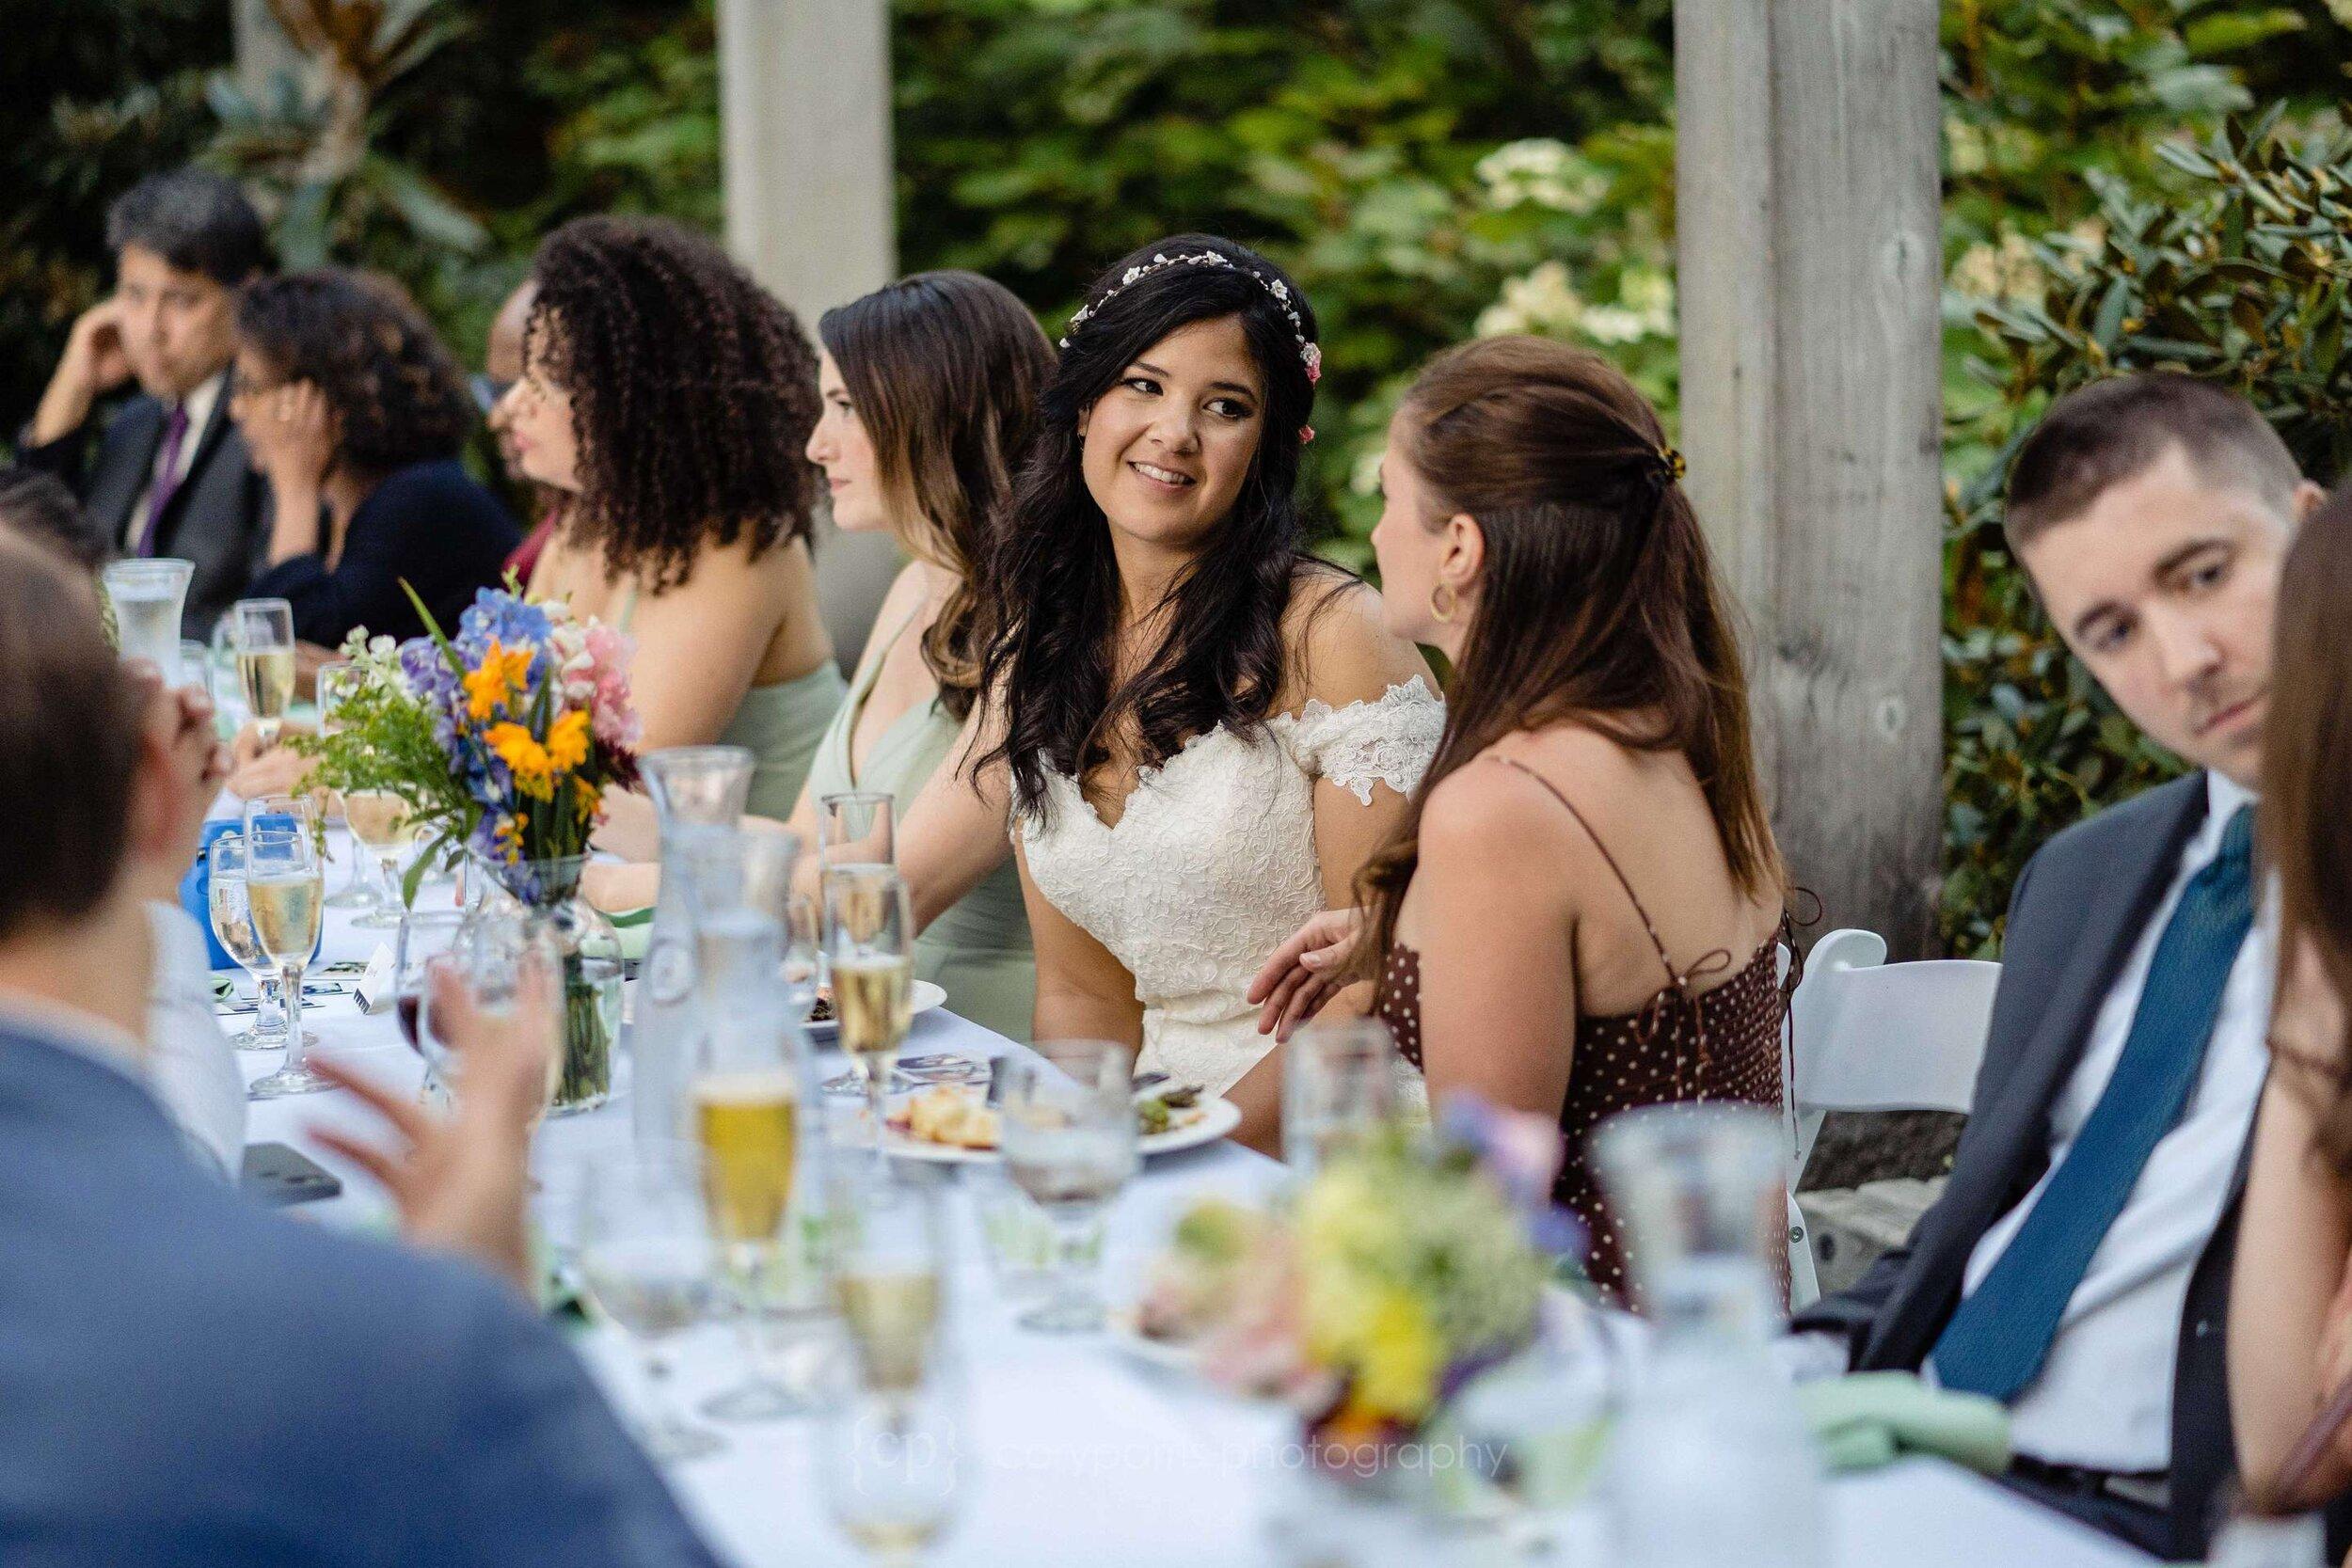 565-washington-park-arboretum-wedding.jpg